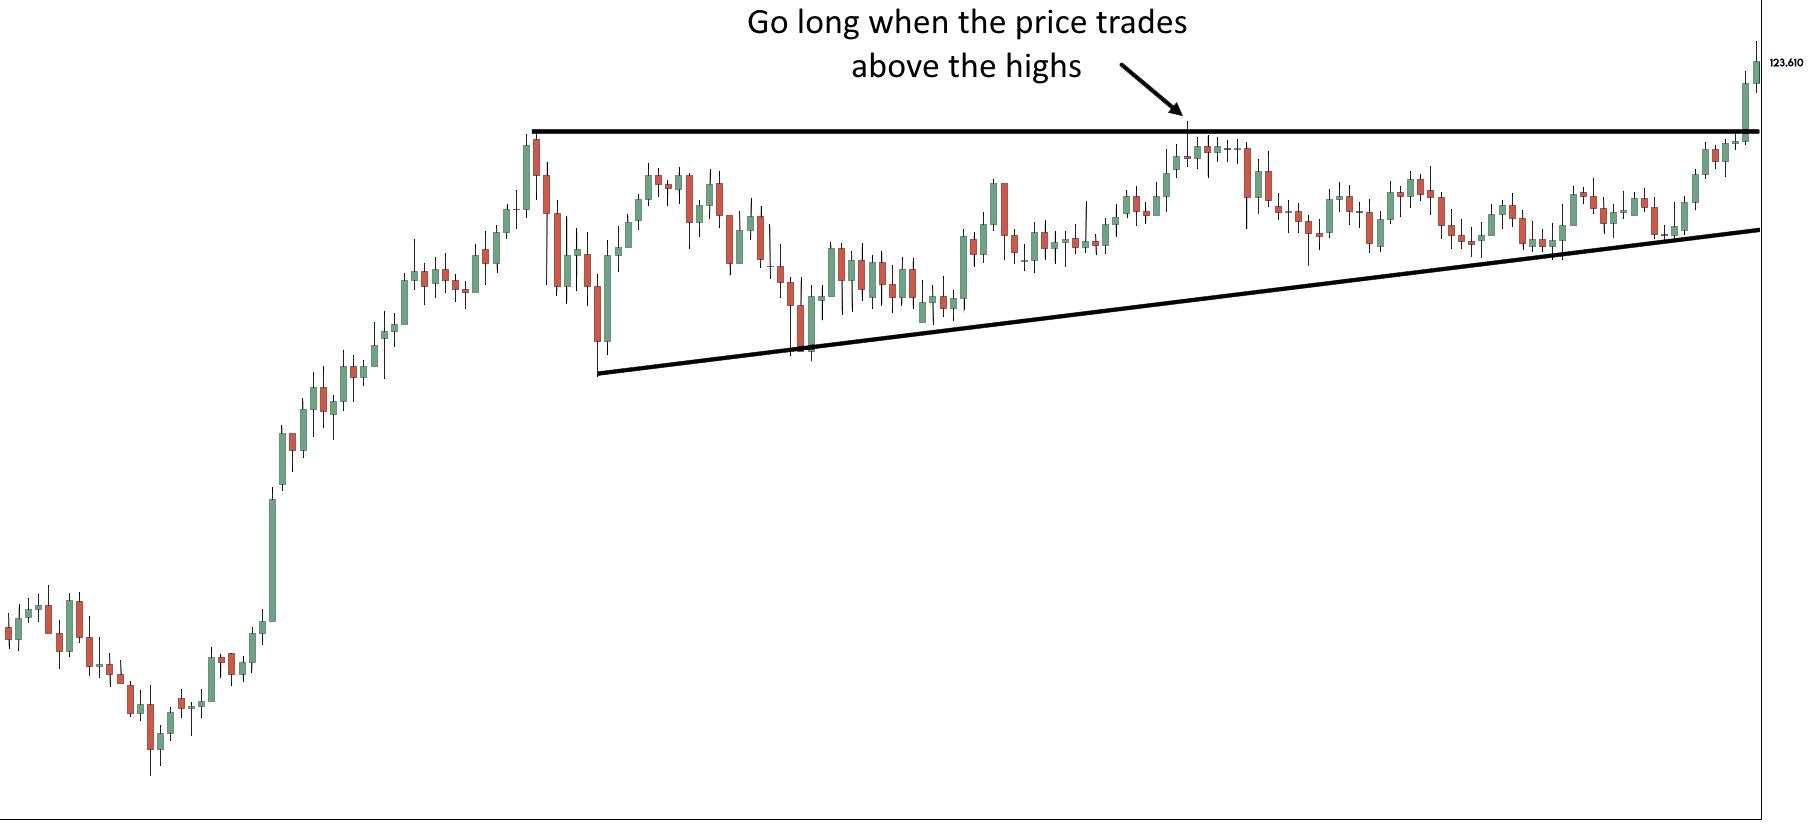 Ascending Triangle Pattern Chart Sample 2 - Finance Brokerage